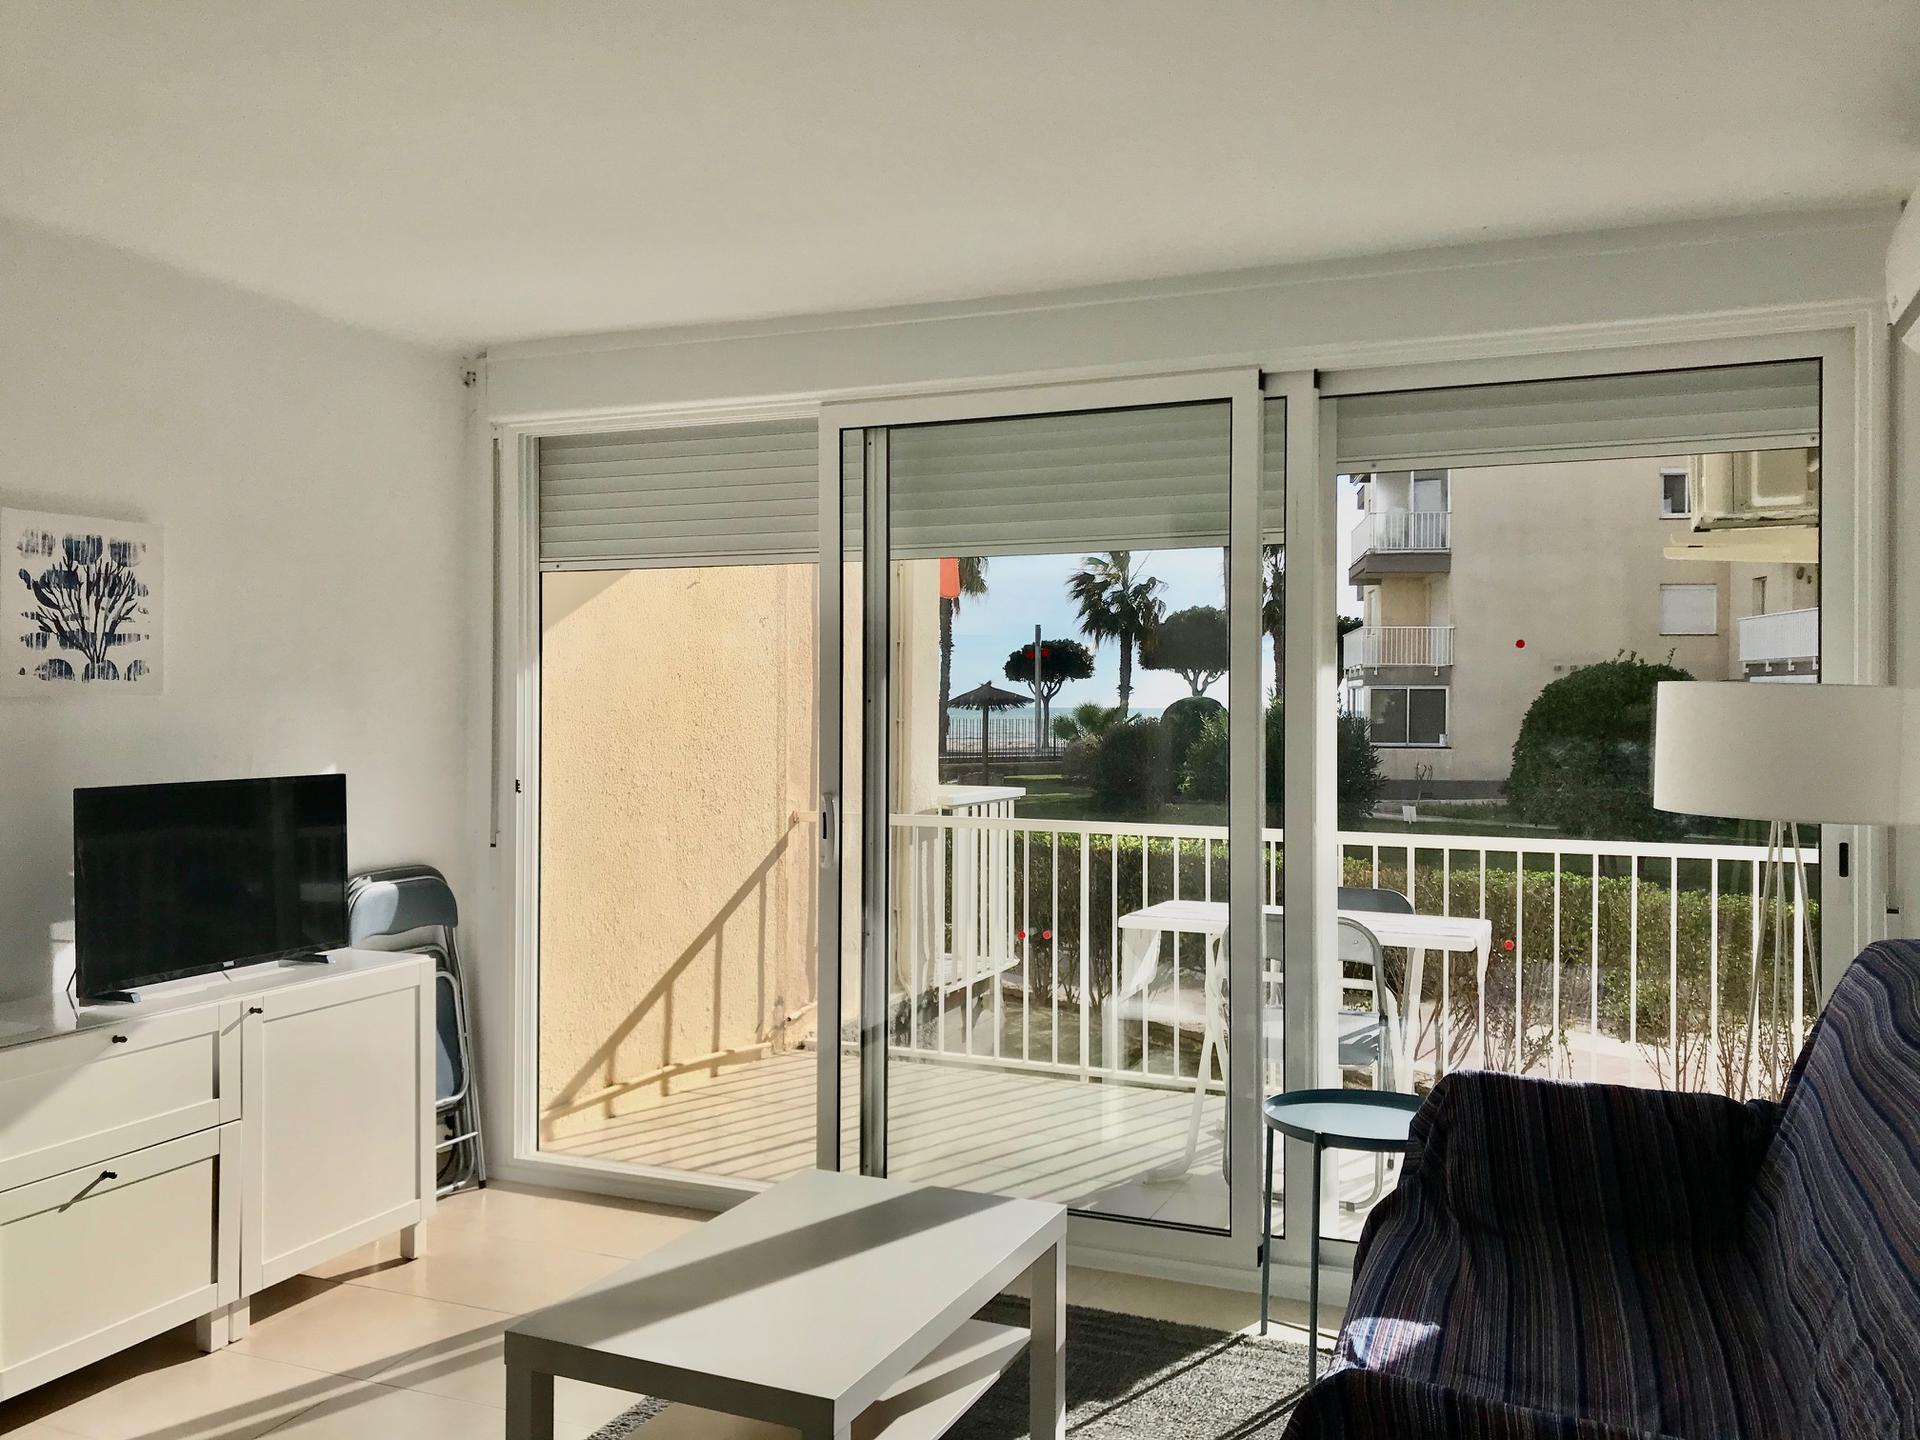 Apartamento -                                       Cambrils -                                       1 dormitorios -                                       5 ocupantes